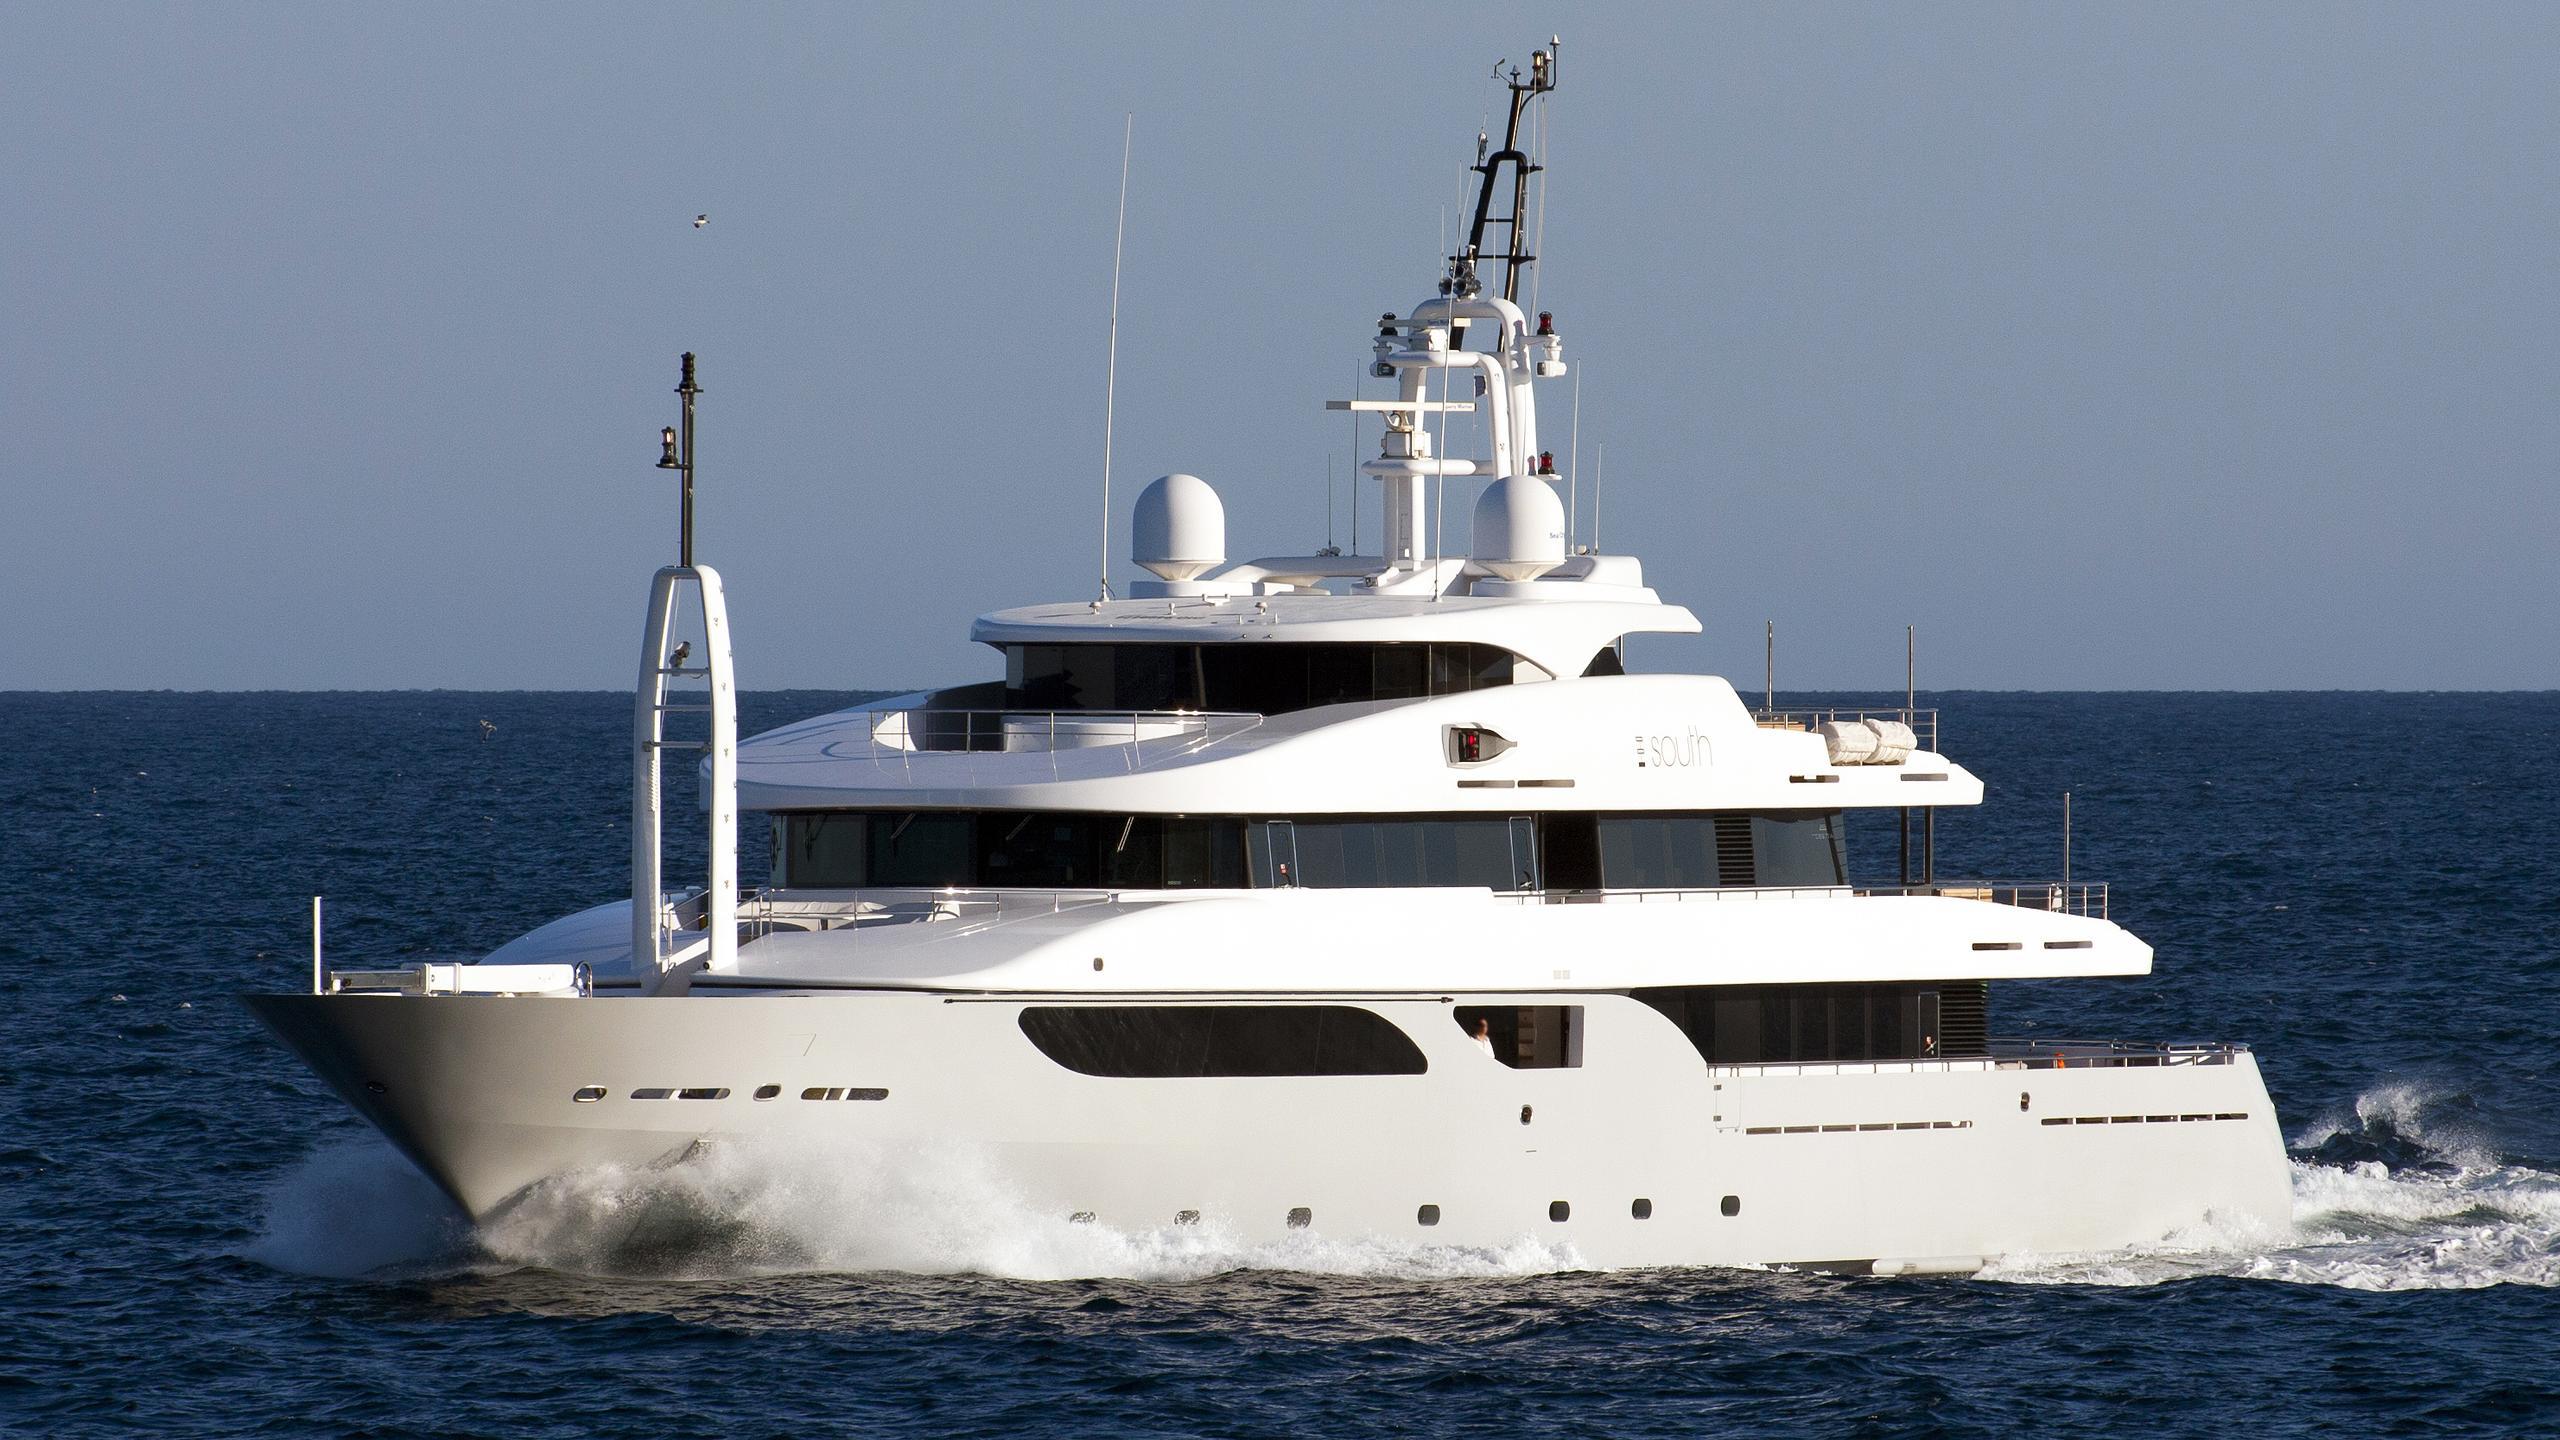 rarity-syna-south-motor-yacht-rossinavi-2008-53m-half-stern